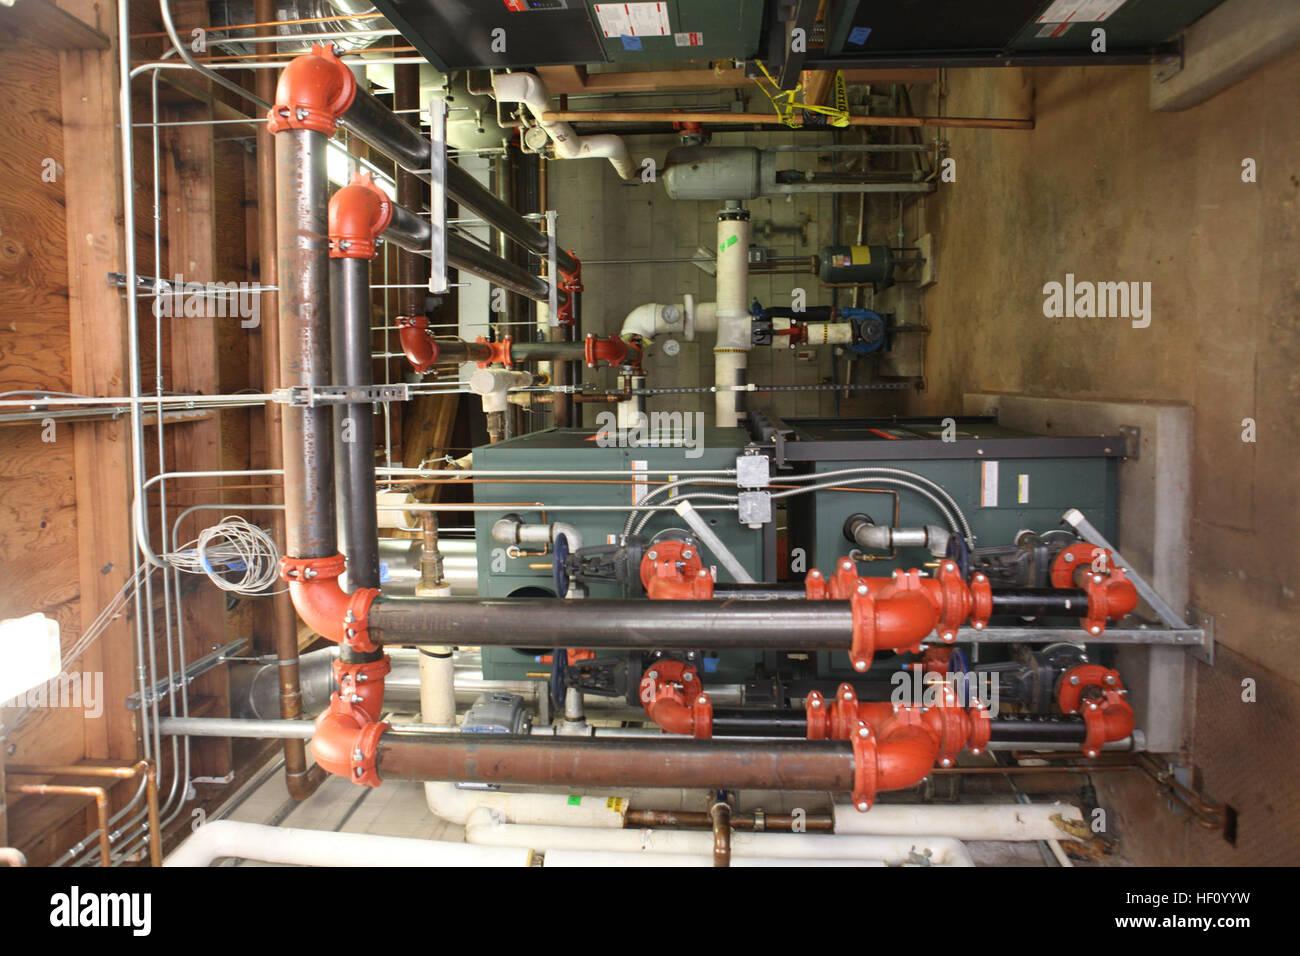 Wash Boiler Stockfotos & Wash Boiler Bilder - Alamy